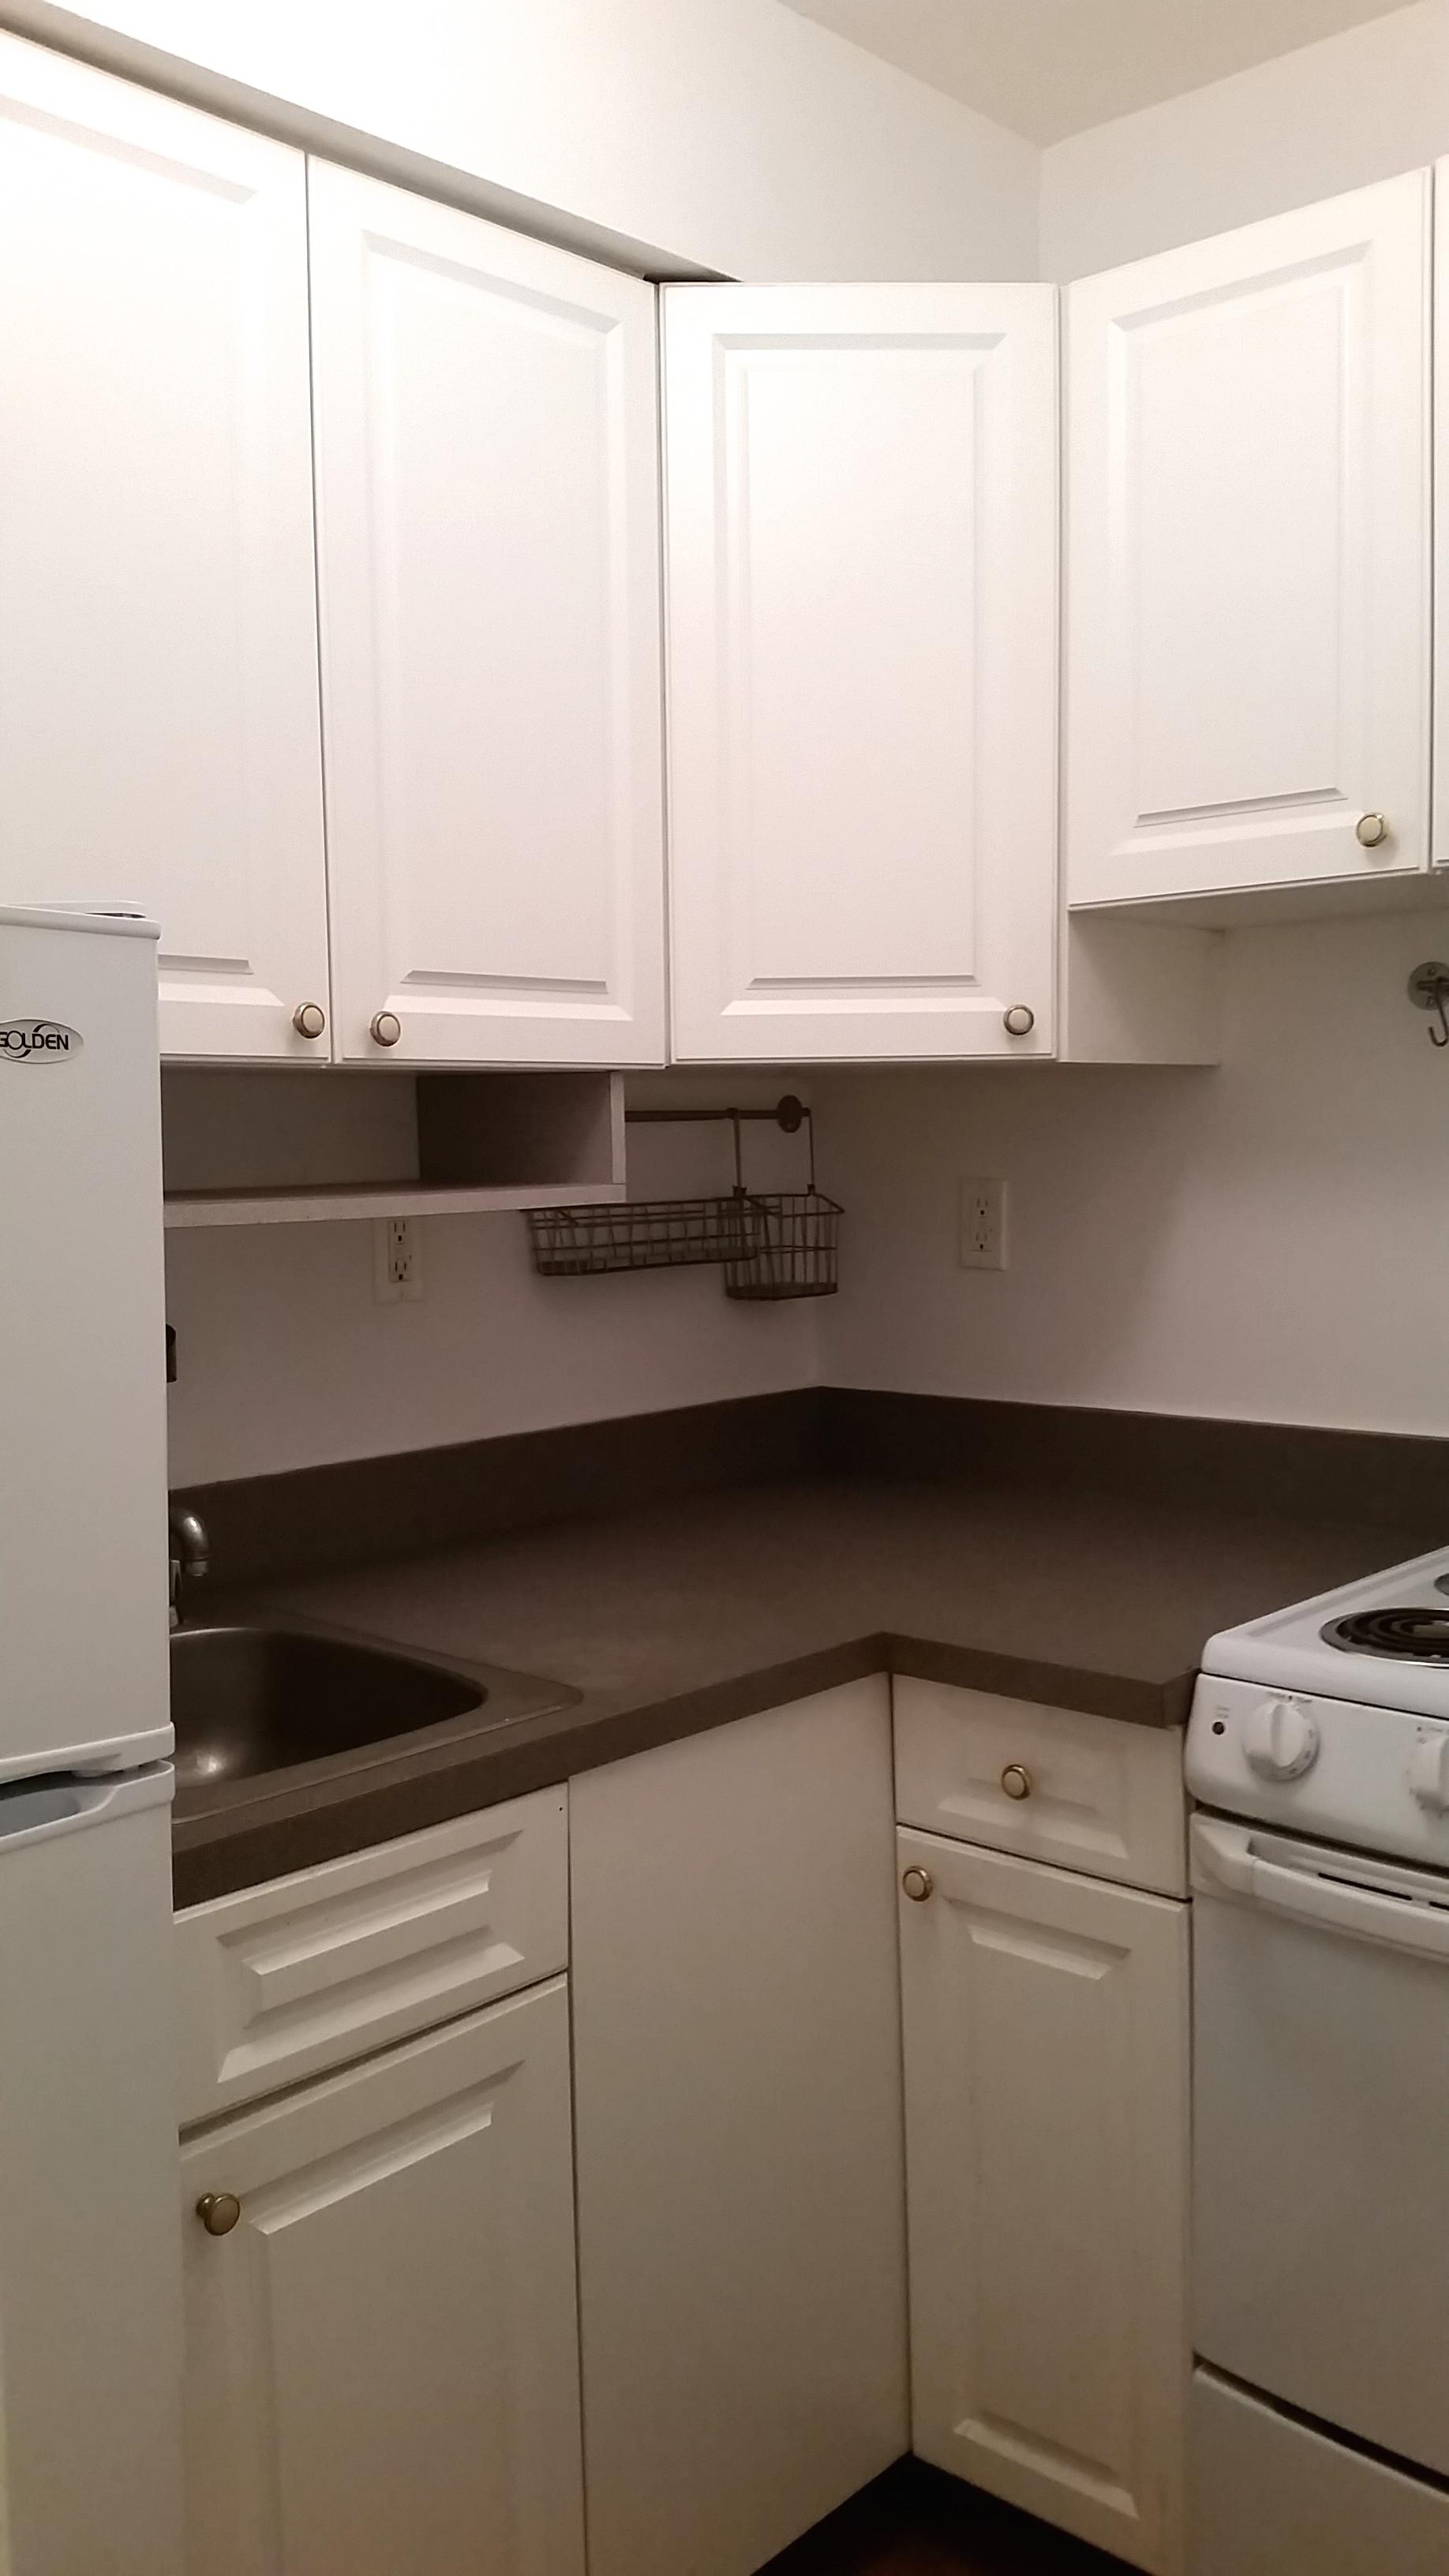 3F - Kitchen